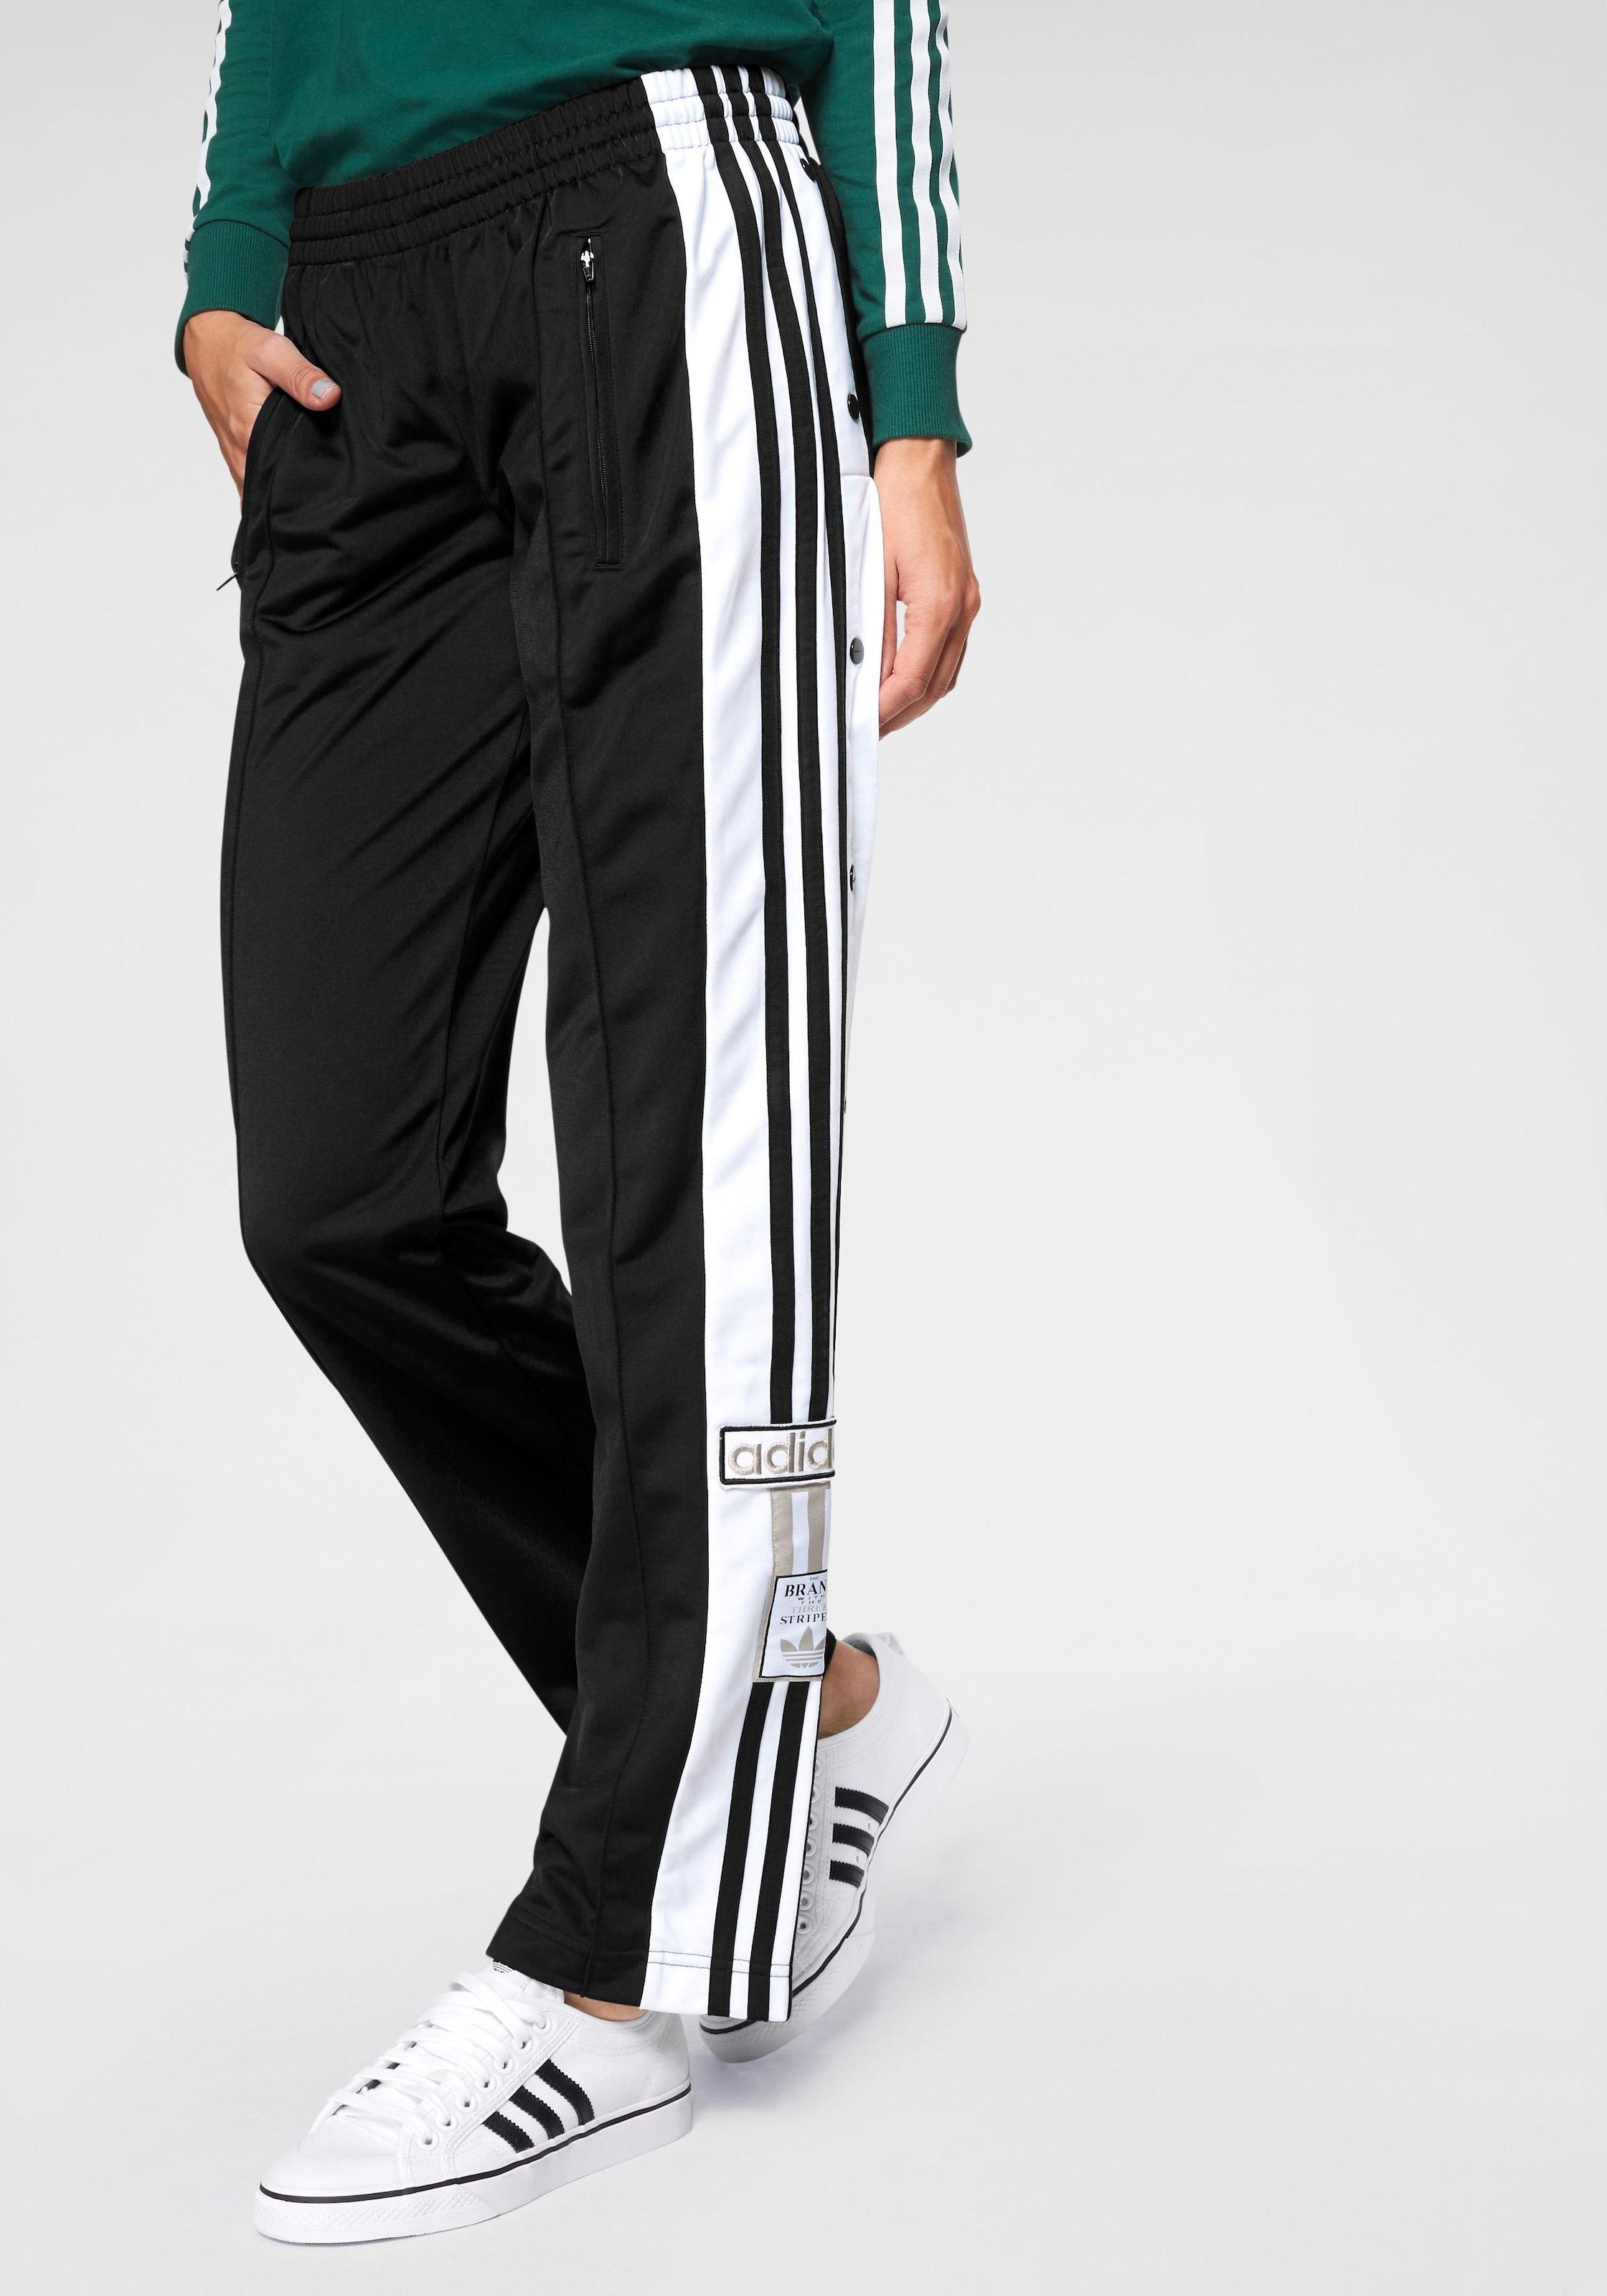 adidas Originals Trainingshose »ADIBREAK PANT« | BAUR